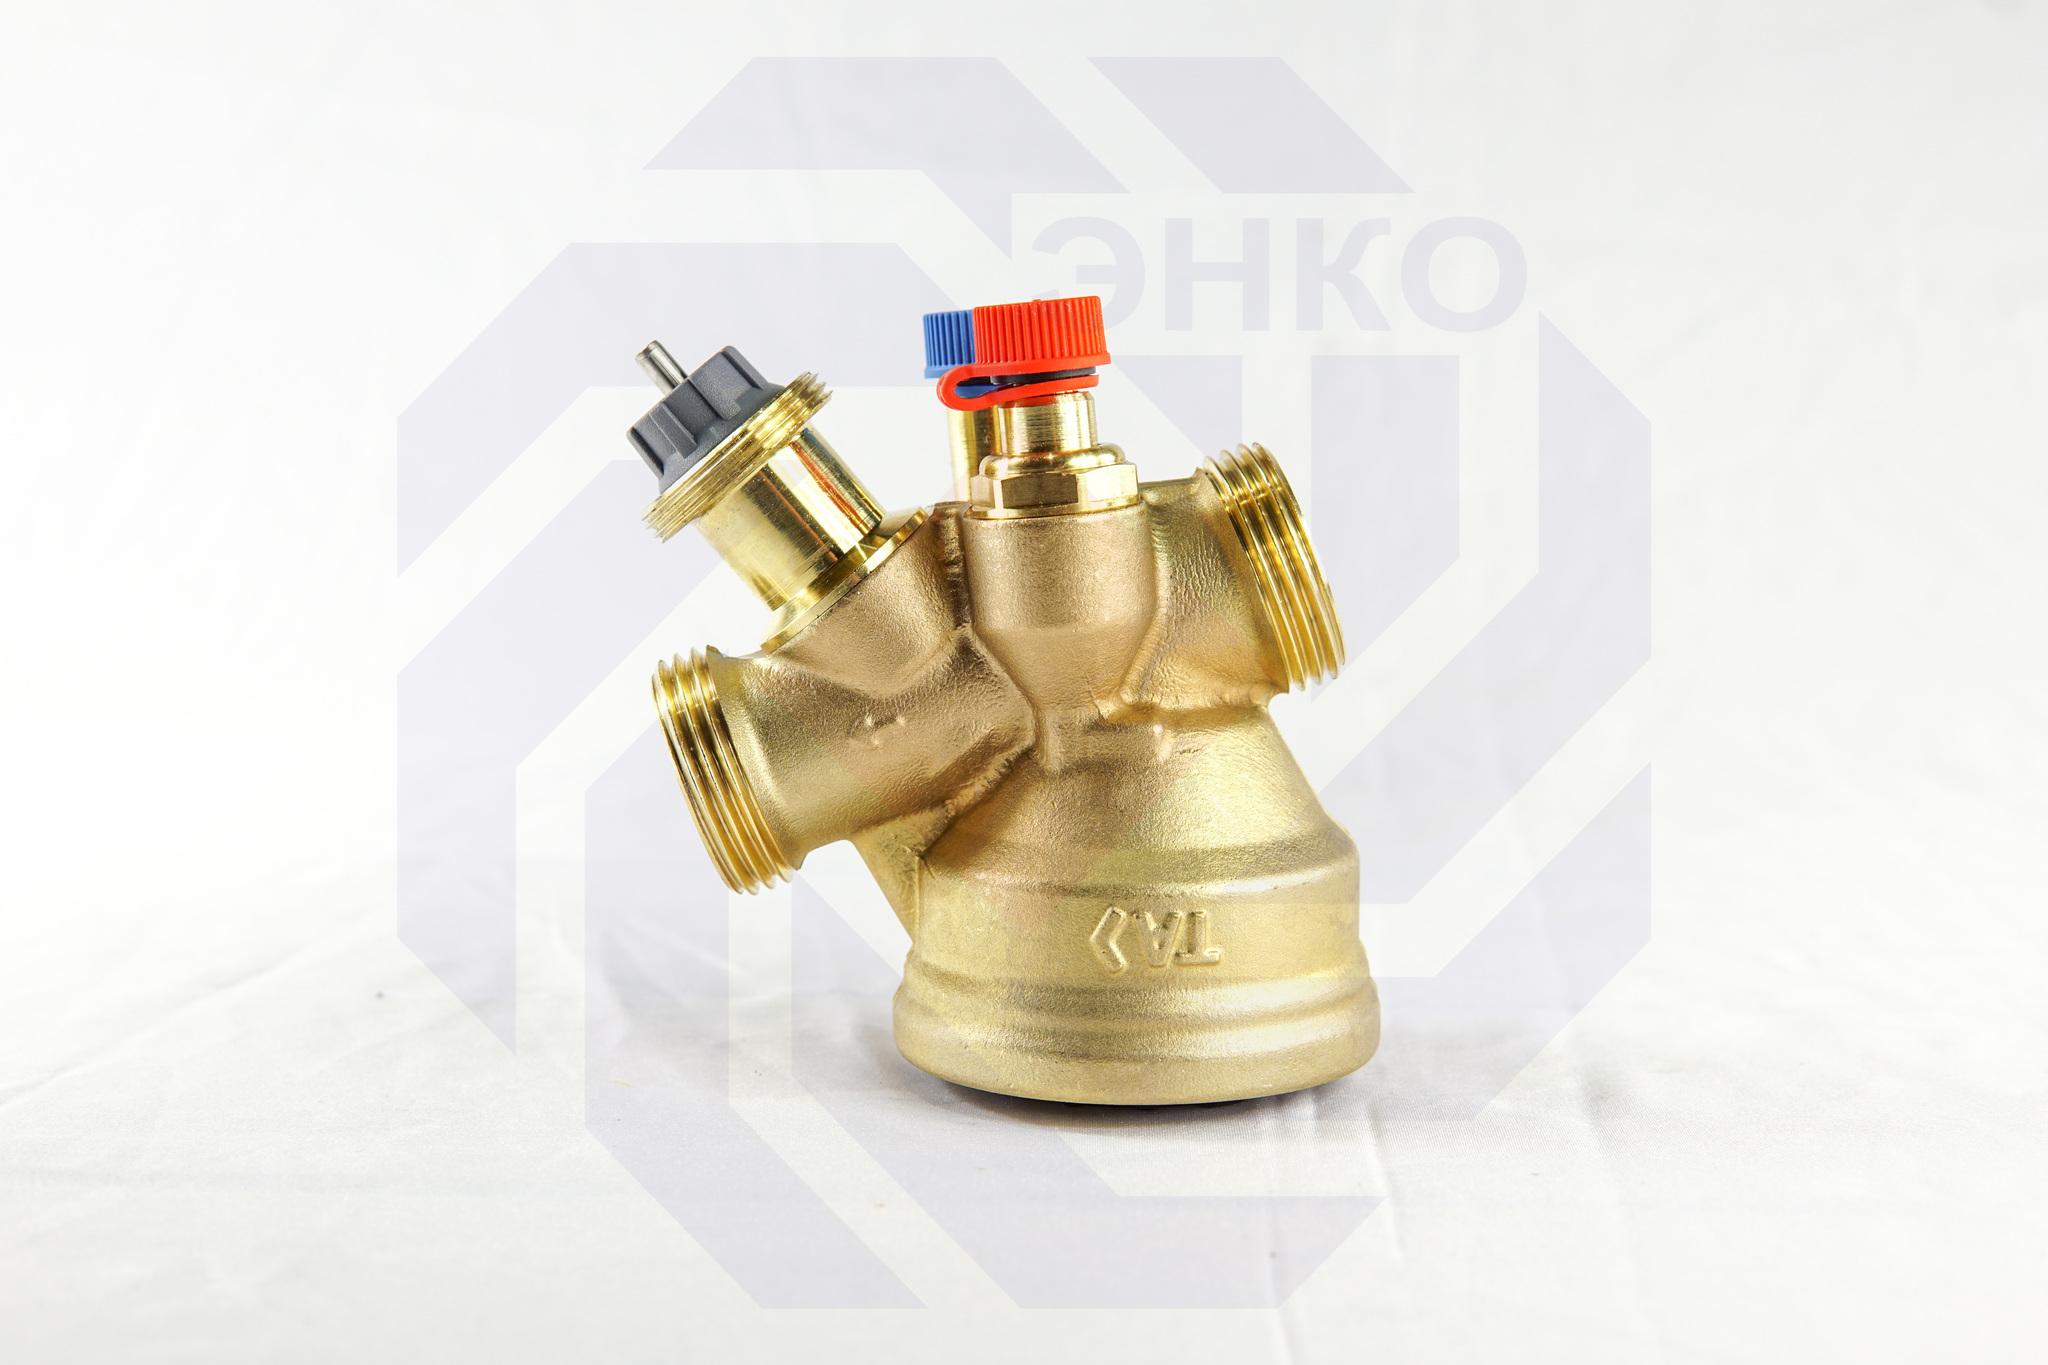 Клапан балансировочный и регулирующий IMI TA-COMPACT-P DN 20